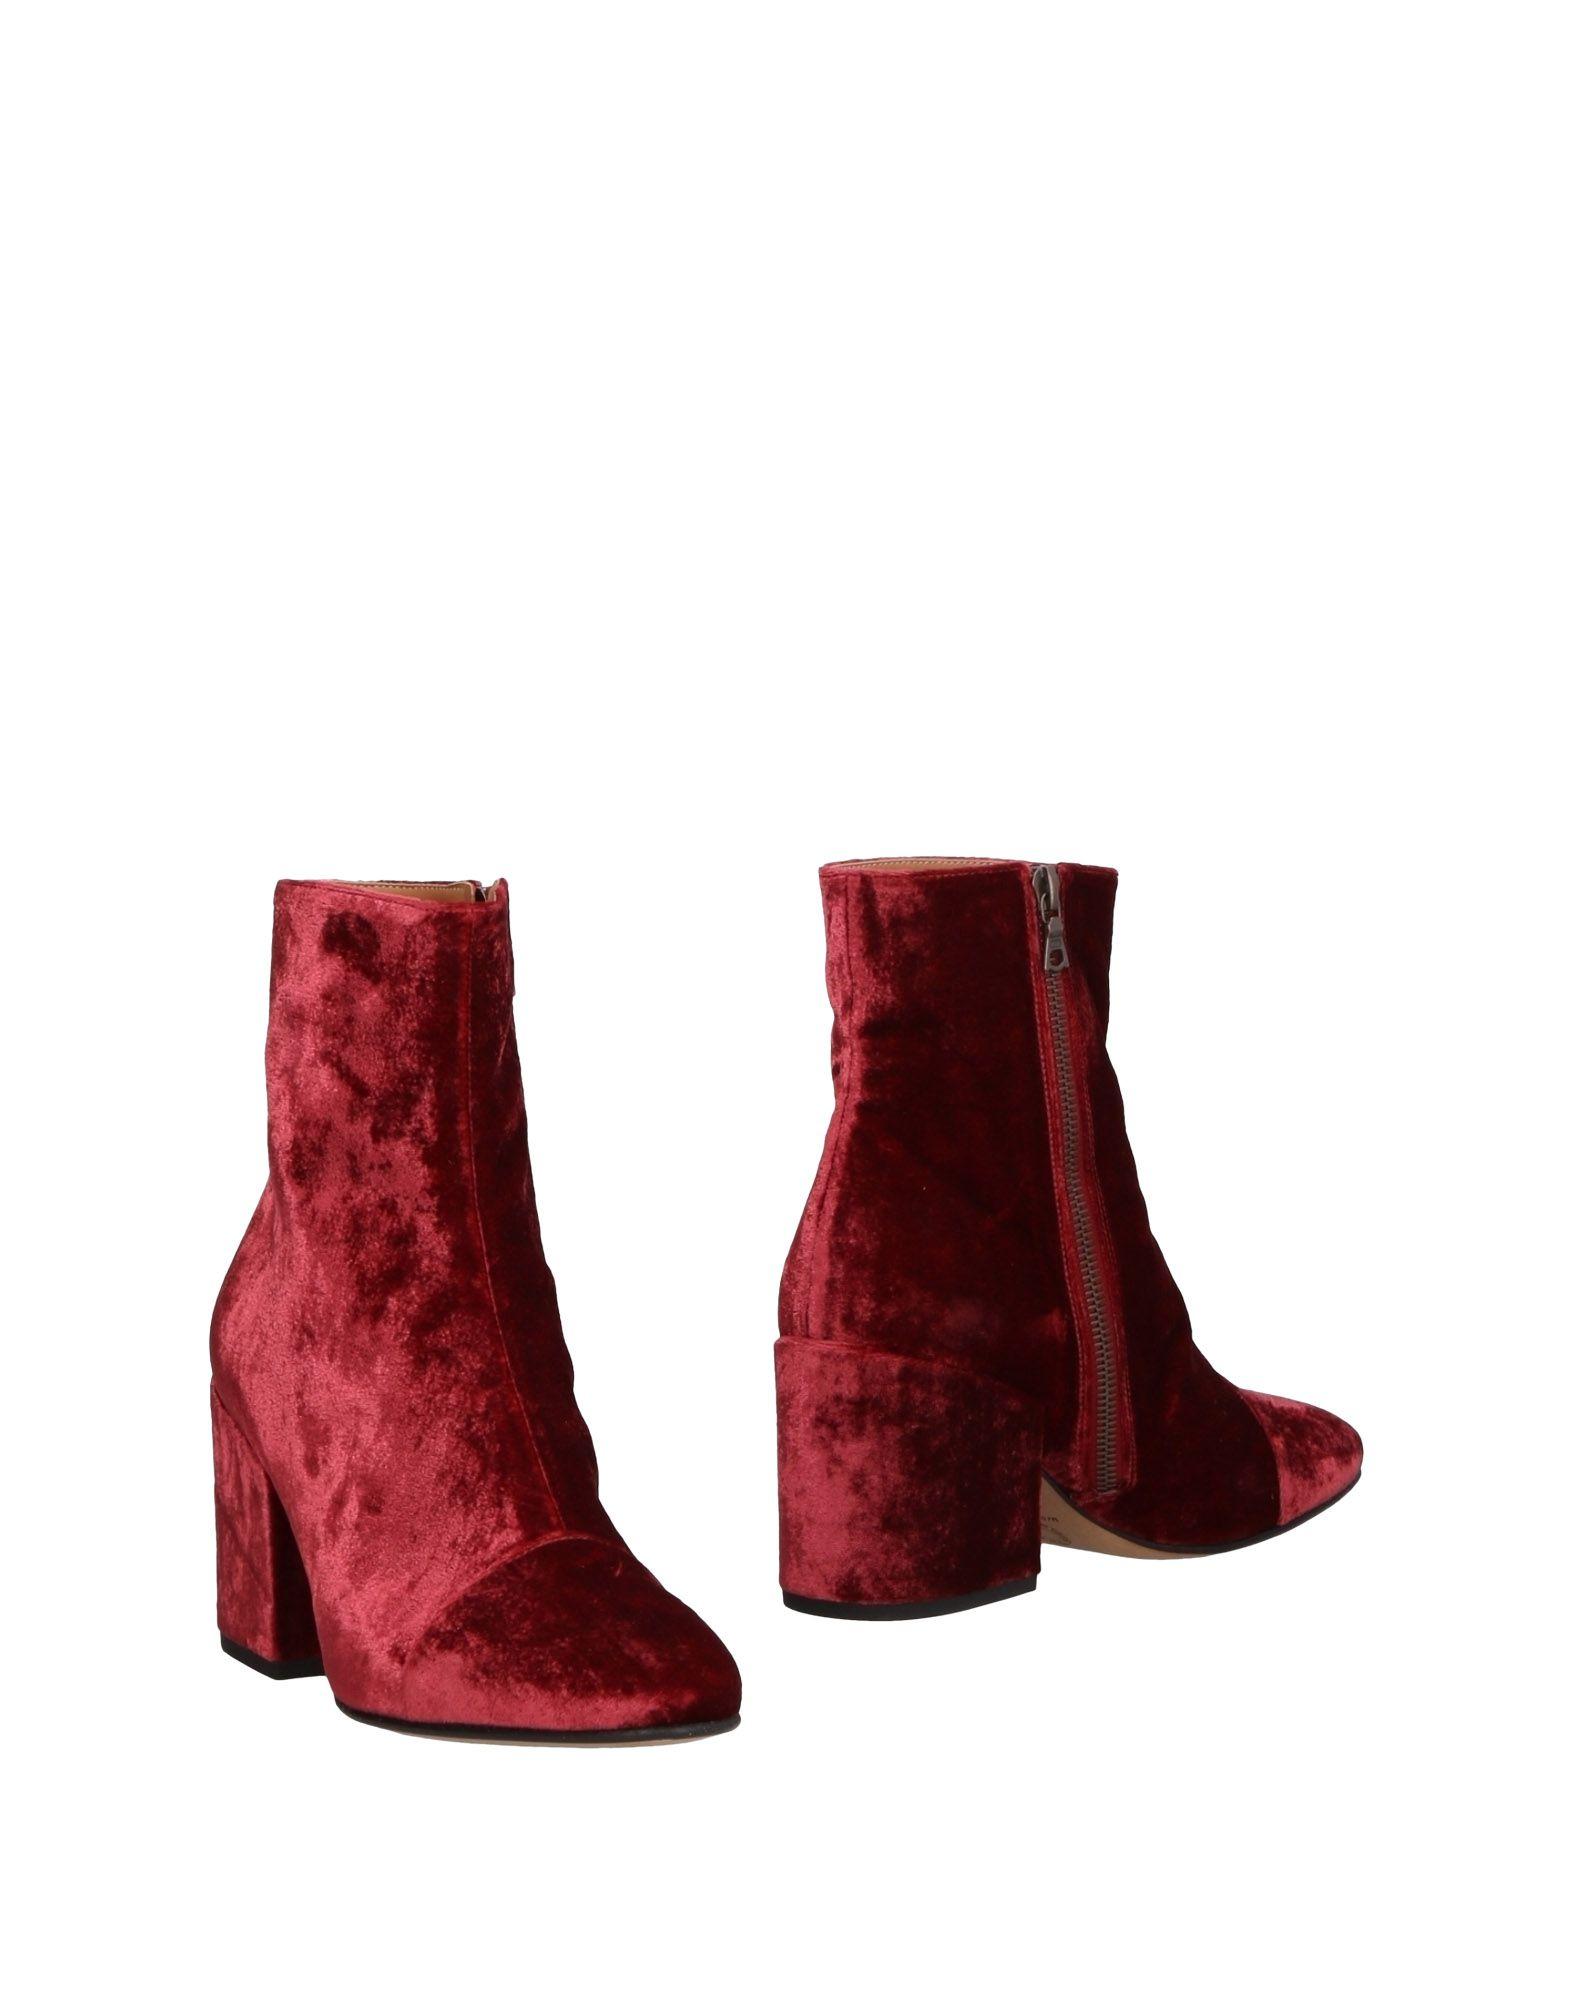 ac1dcae9ef8d7a Dries Van Noten Ankle Boot - Women Dries Van Noten Ankle Boots ...